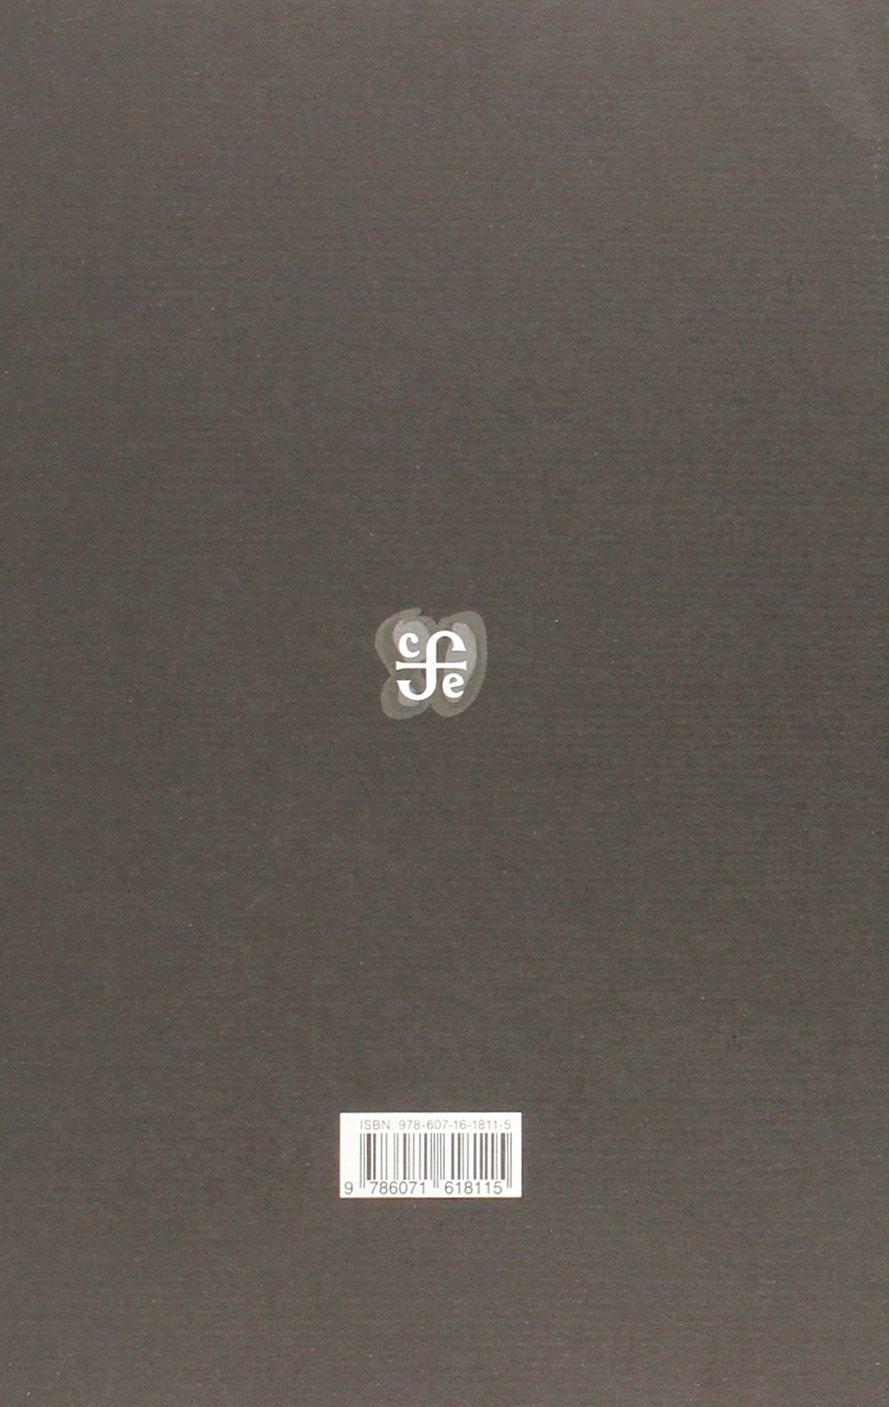 Desandar (Poesia) (Spanish Edition): Ricardo Yañez: 9786071618115: Amazon.com: Books